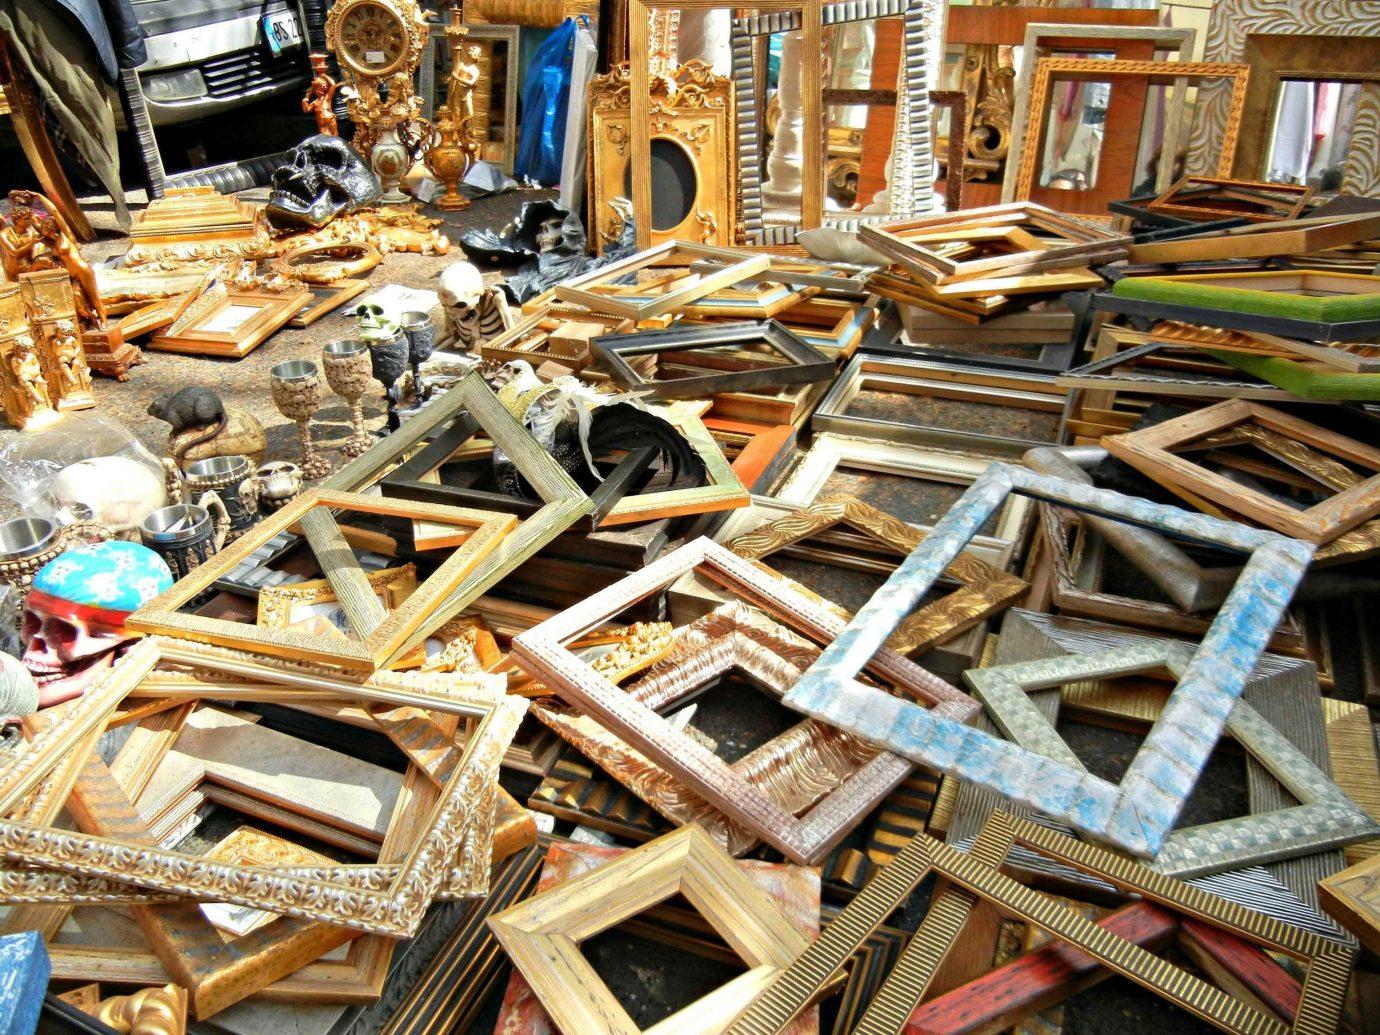 Trip Ideas chair scrap City public space wood human settlement market wooden art